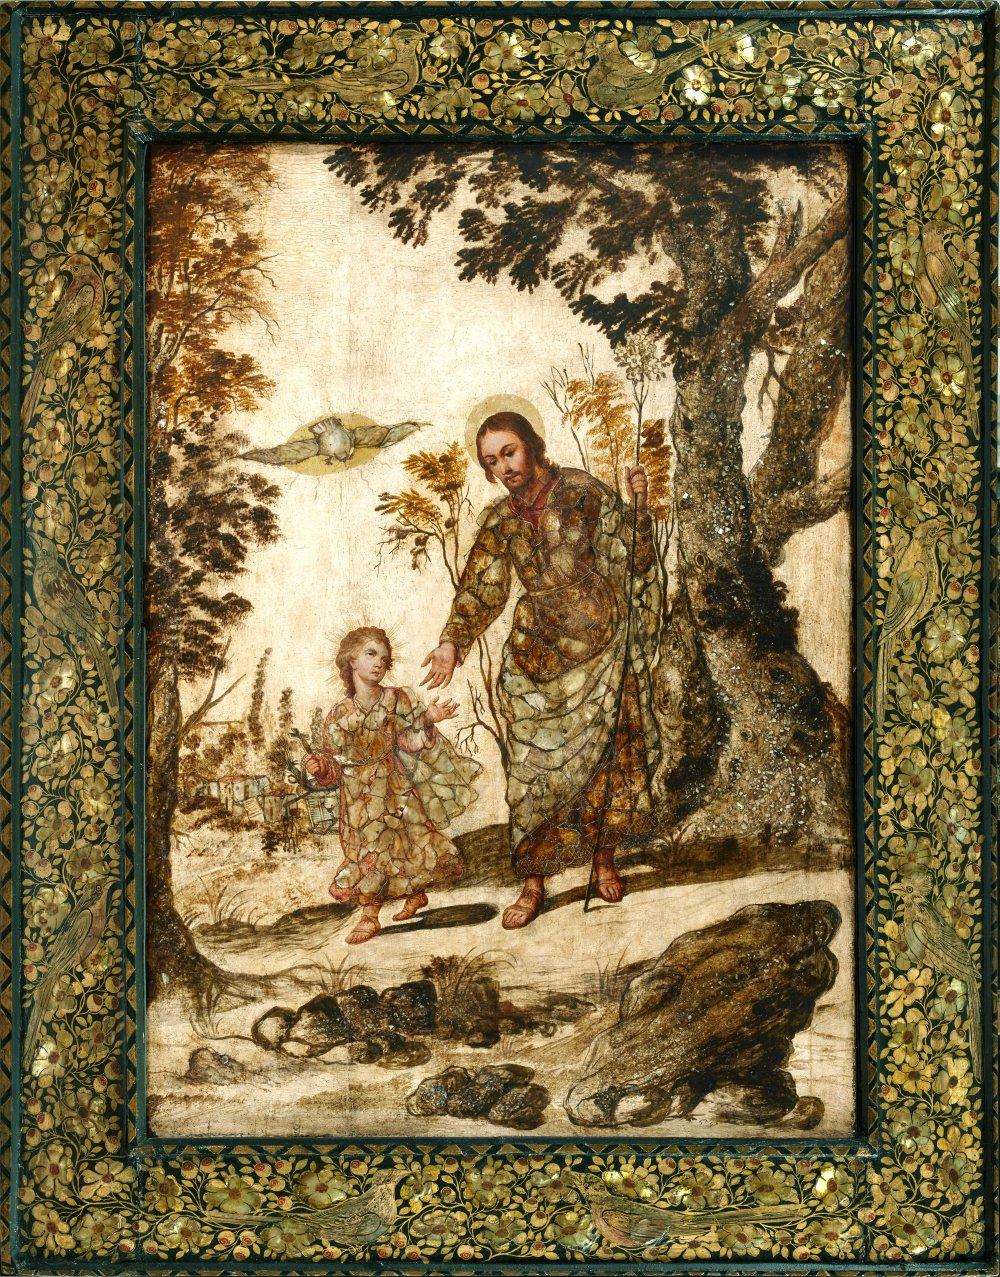 Saint Joseph and the Infant Jesus, Mexico